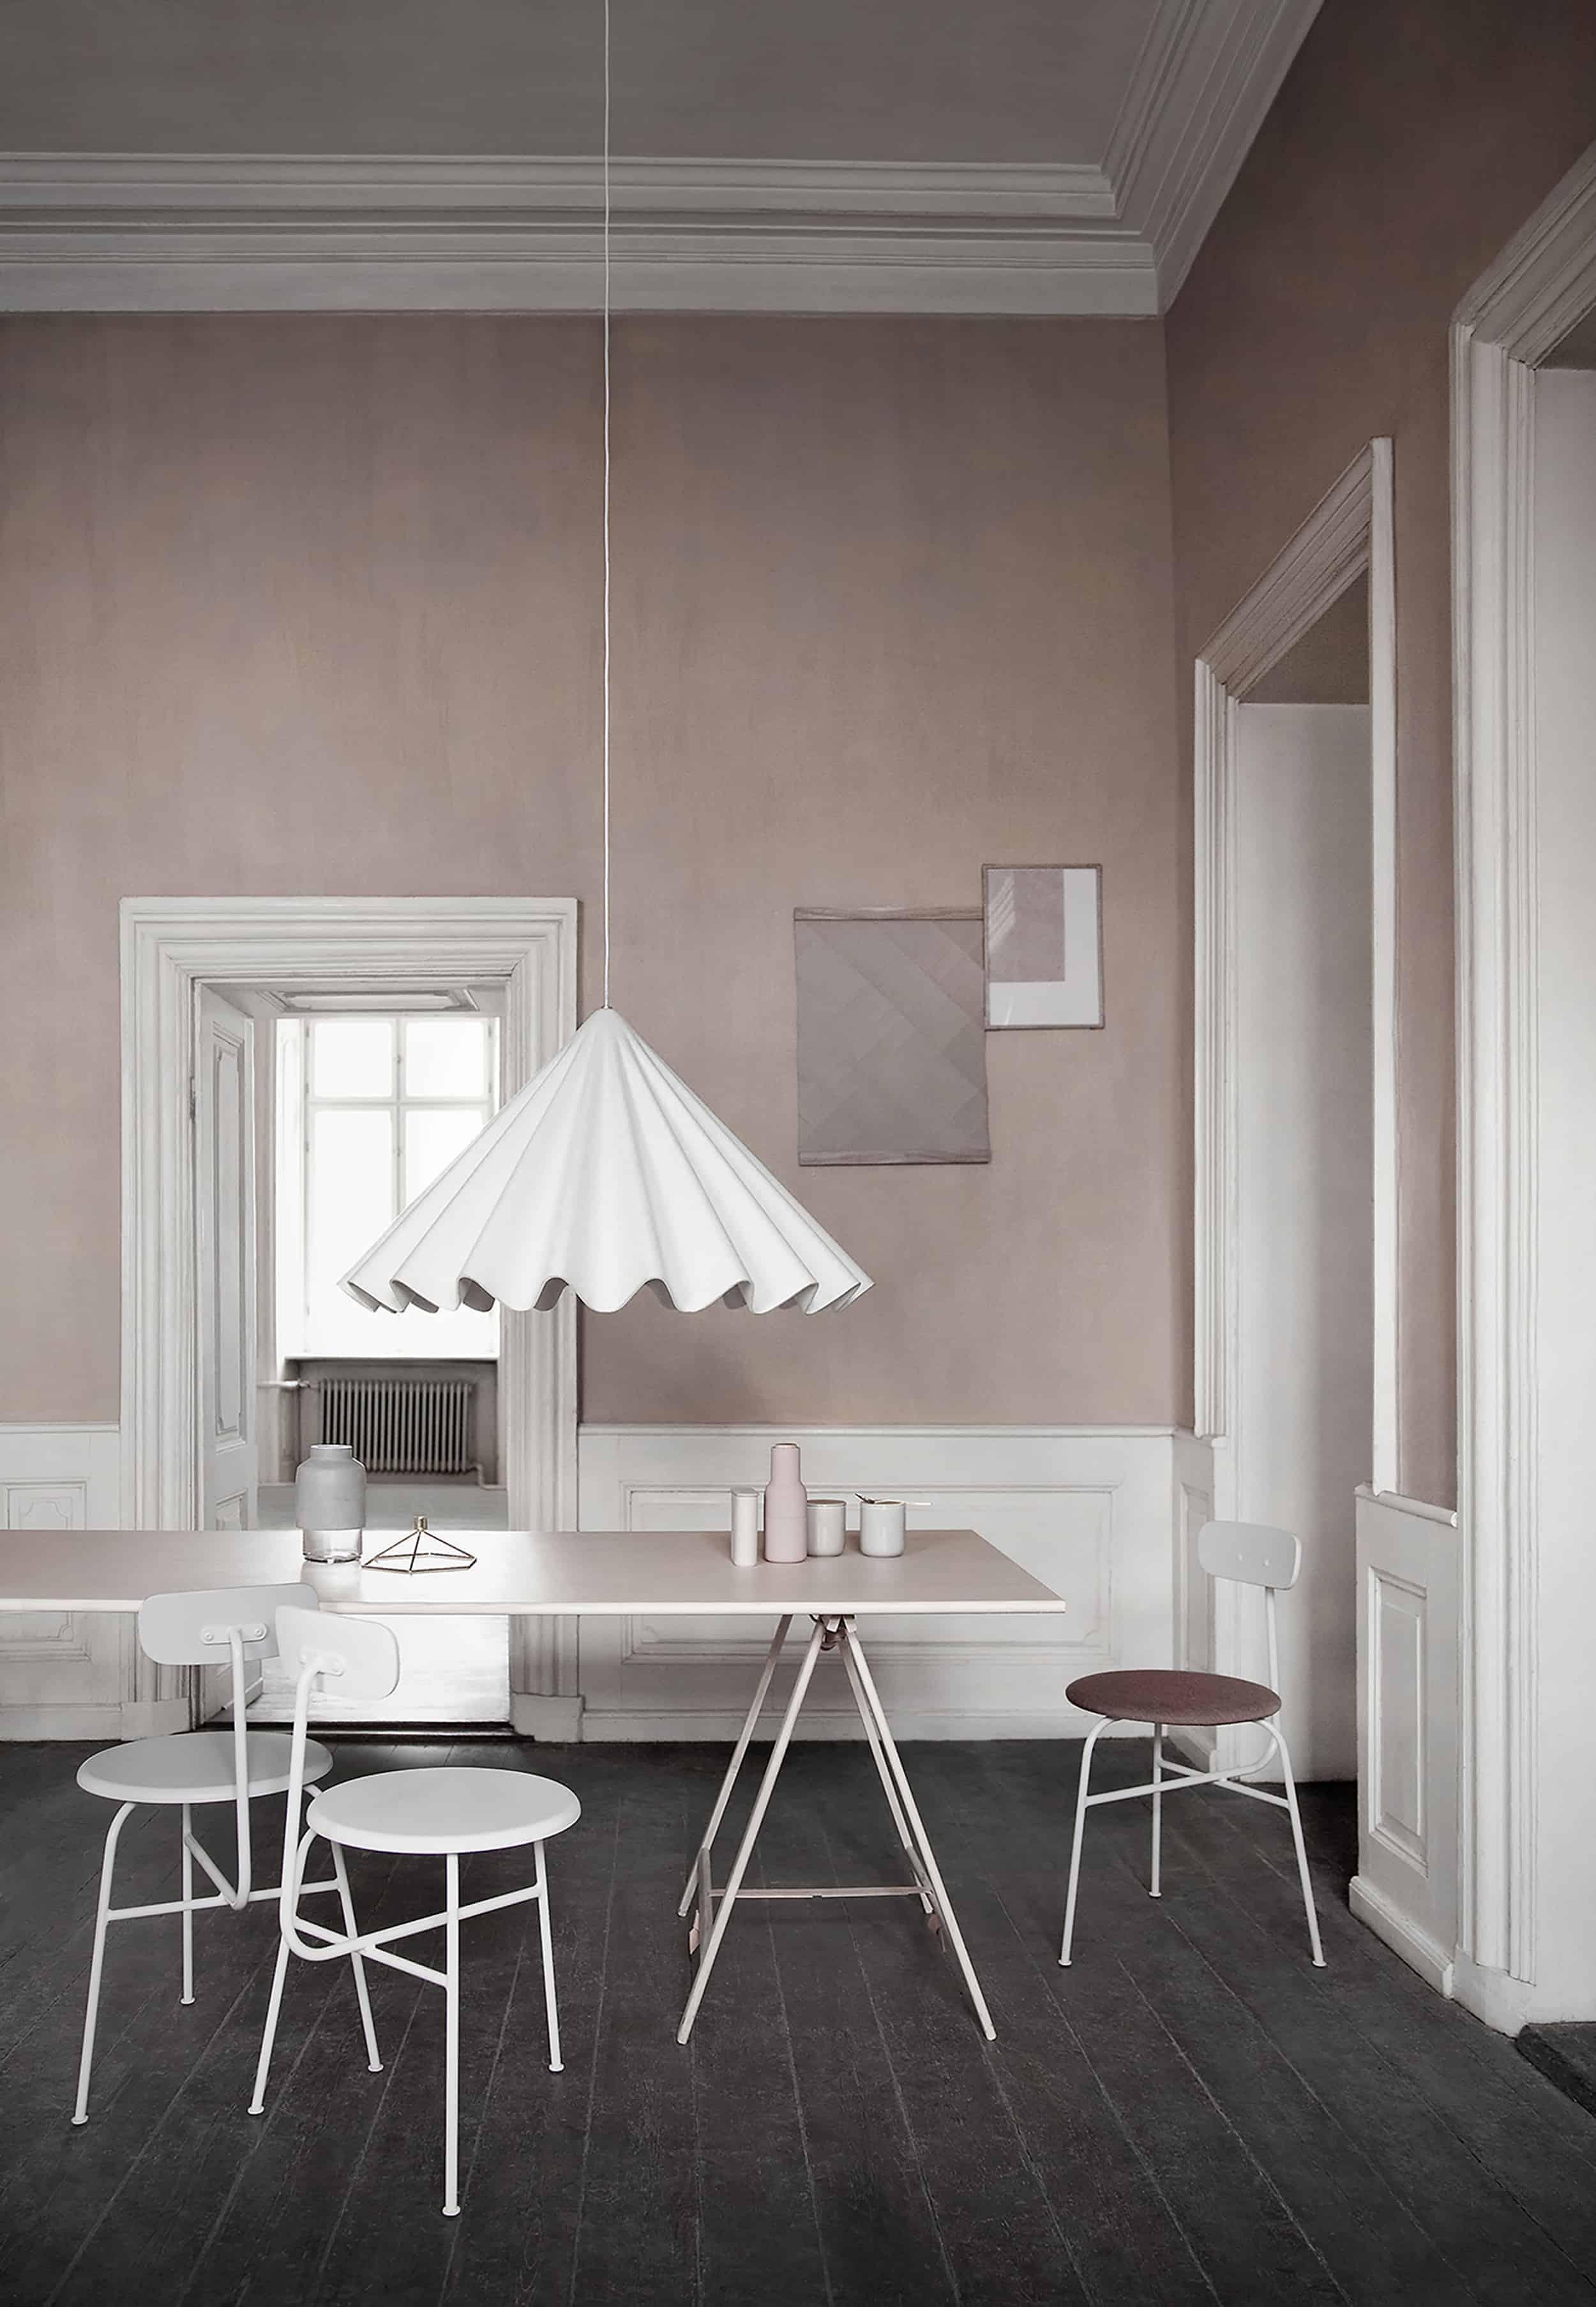 Fabric pendant blush dining room